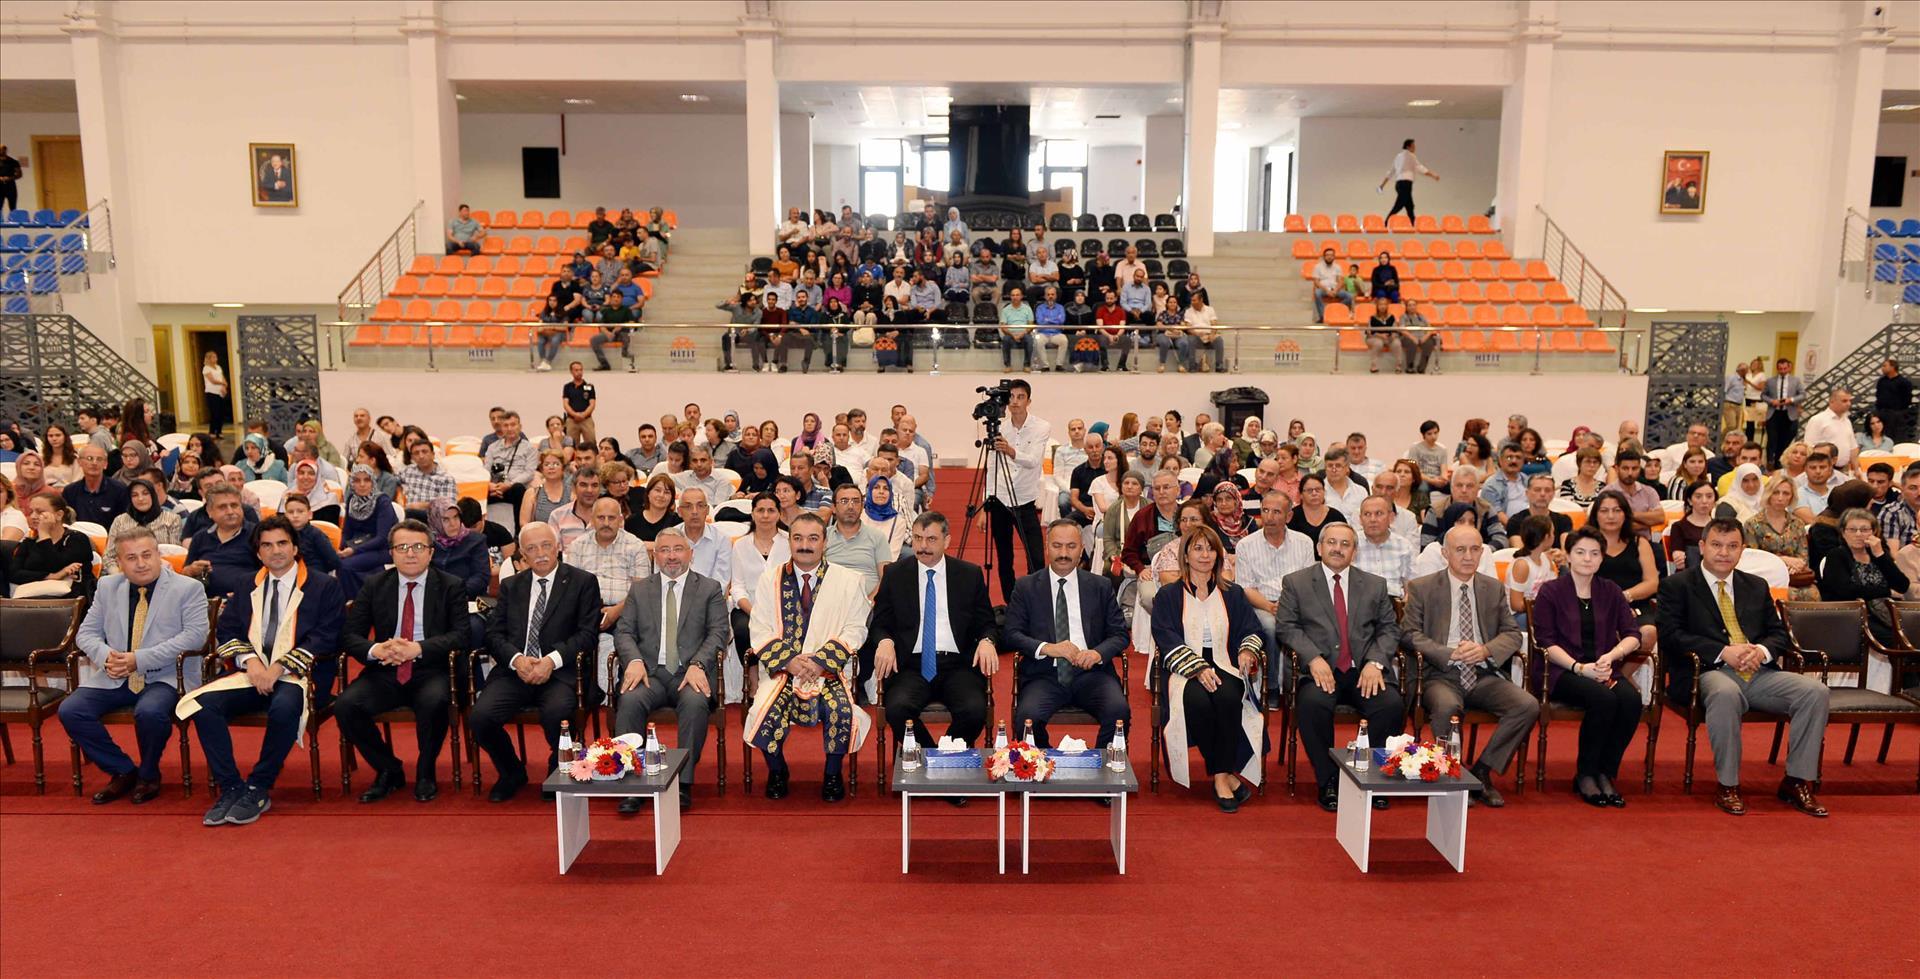 White Coat Ceremony of New Medical Students